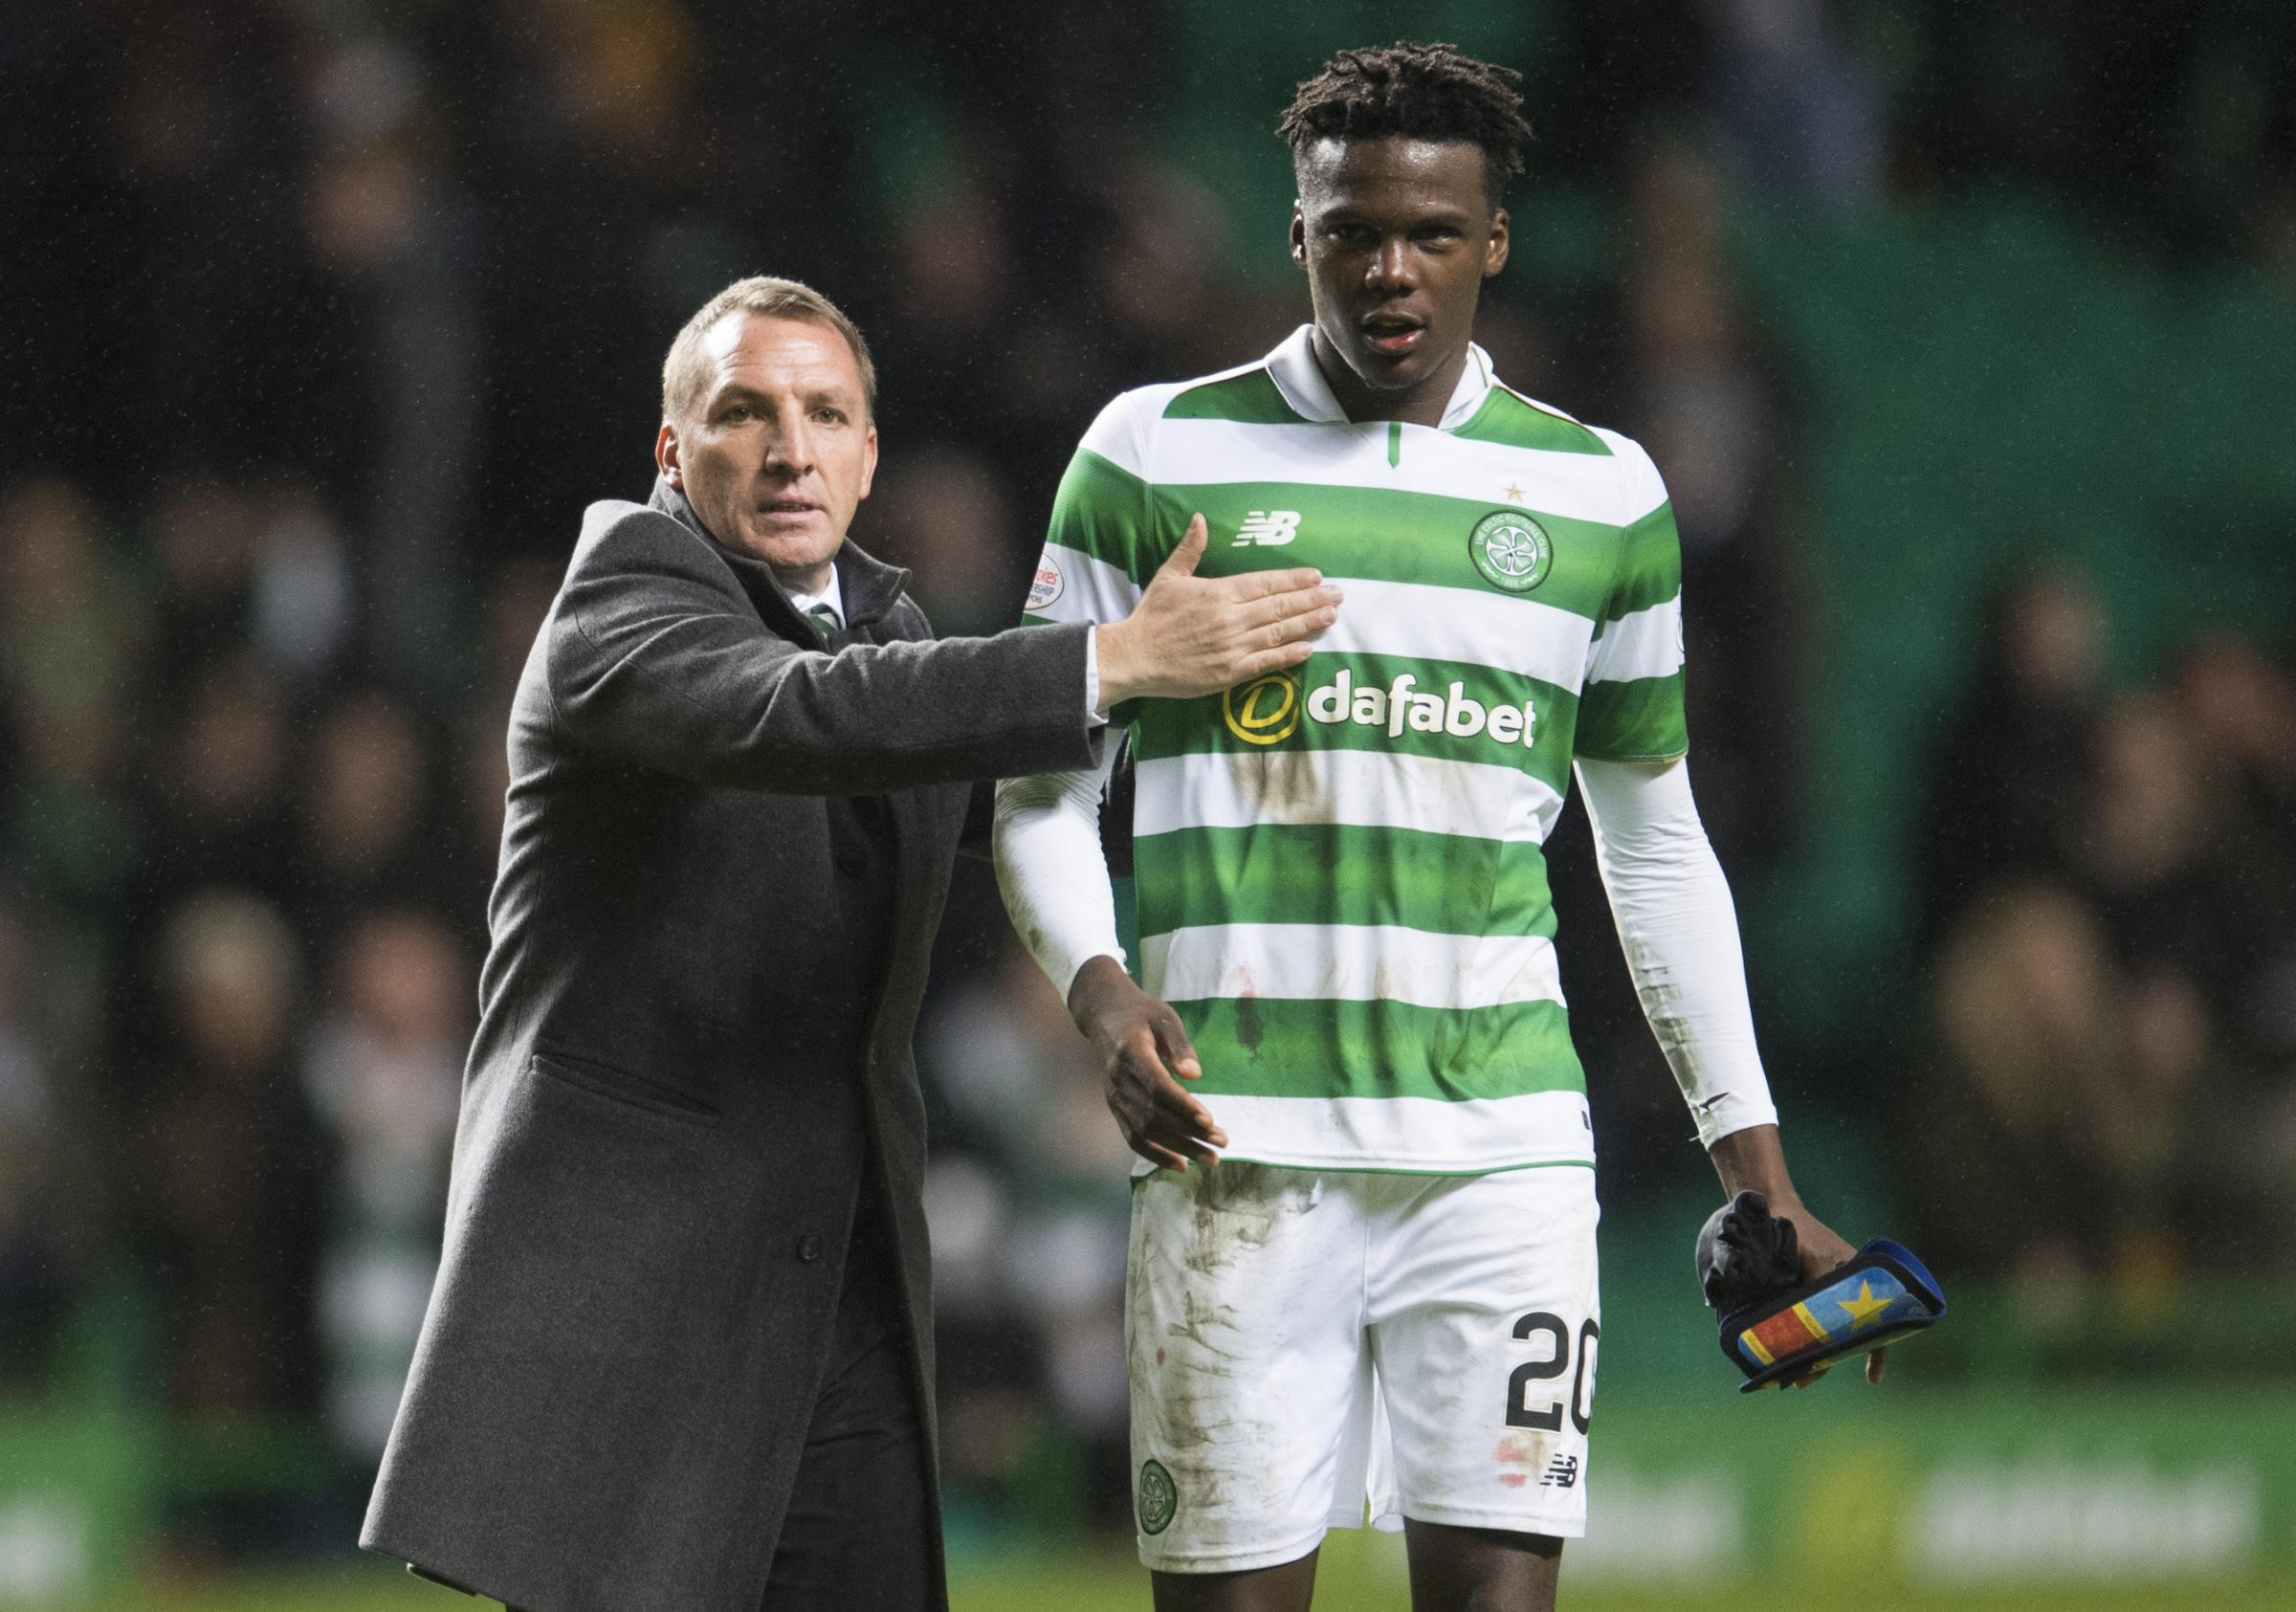 Celtic defender Dedryck Boyata the surprise call of the season so far